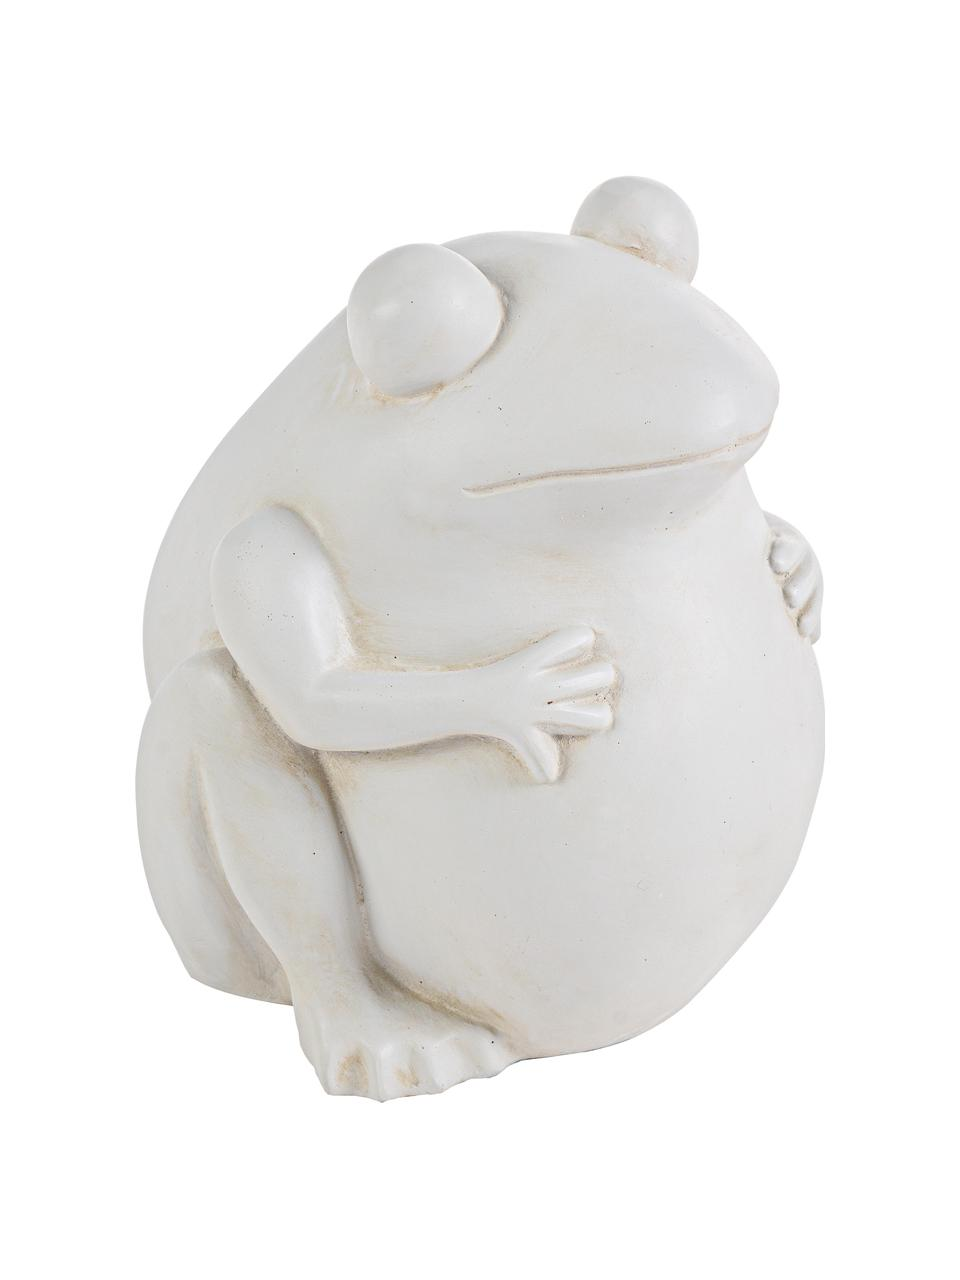 Portavaso Frog, Materiale sintetico, Bianco latteo, Larg. 28 x Alt. 30 cm